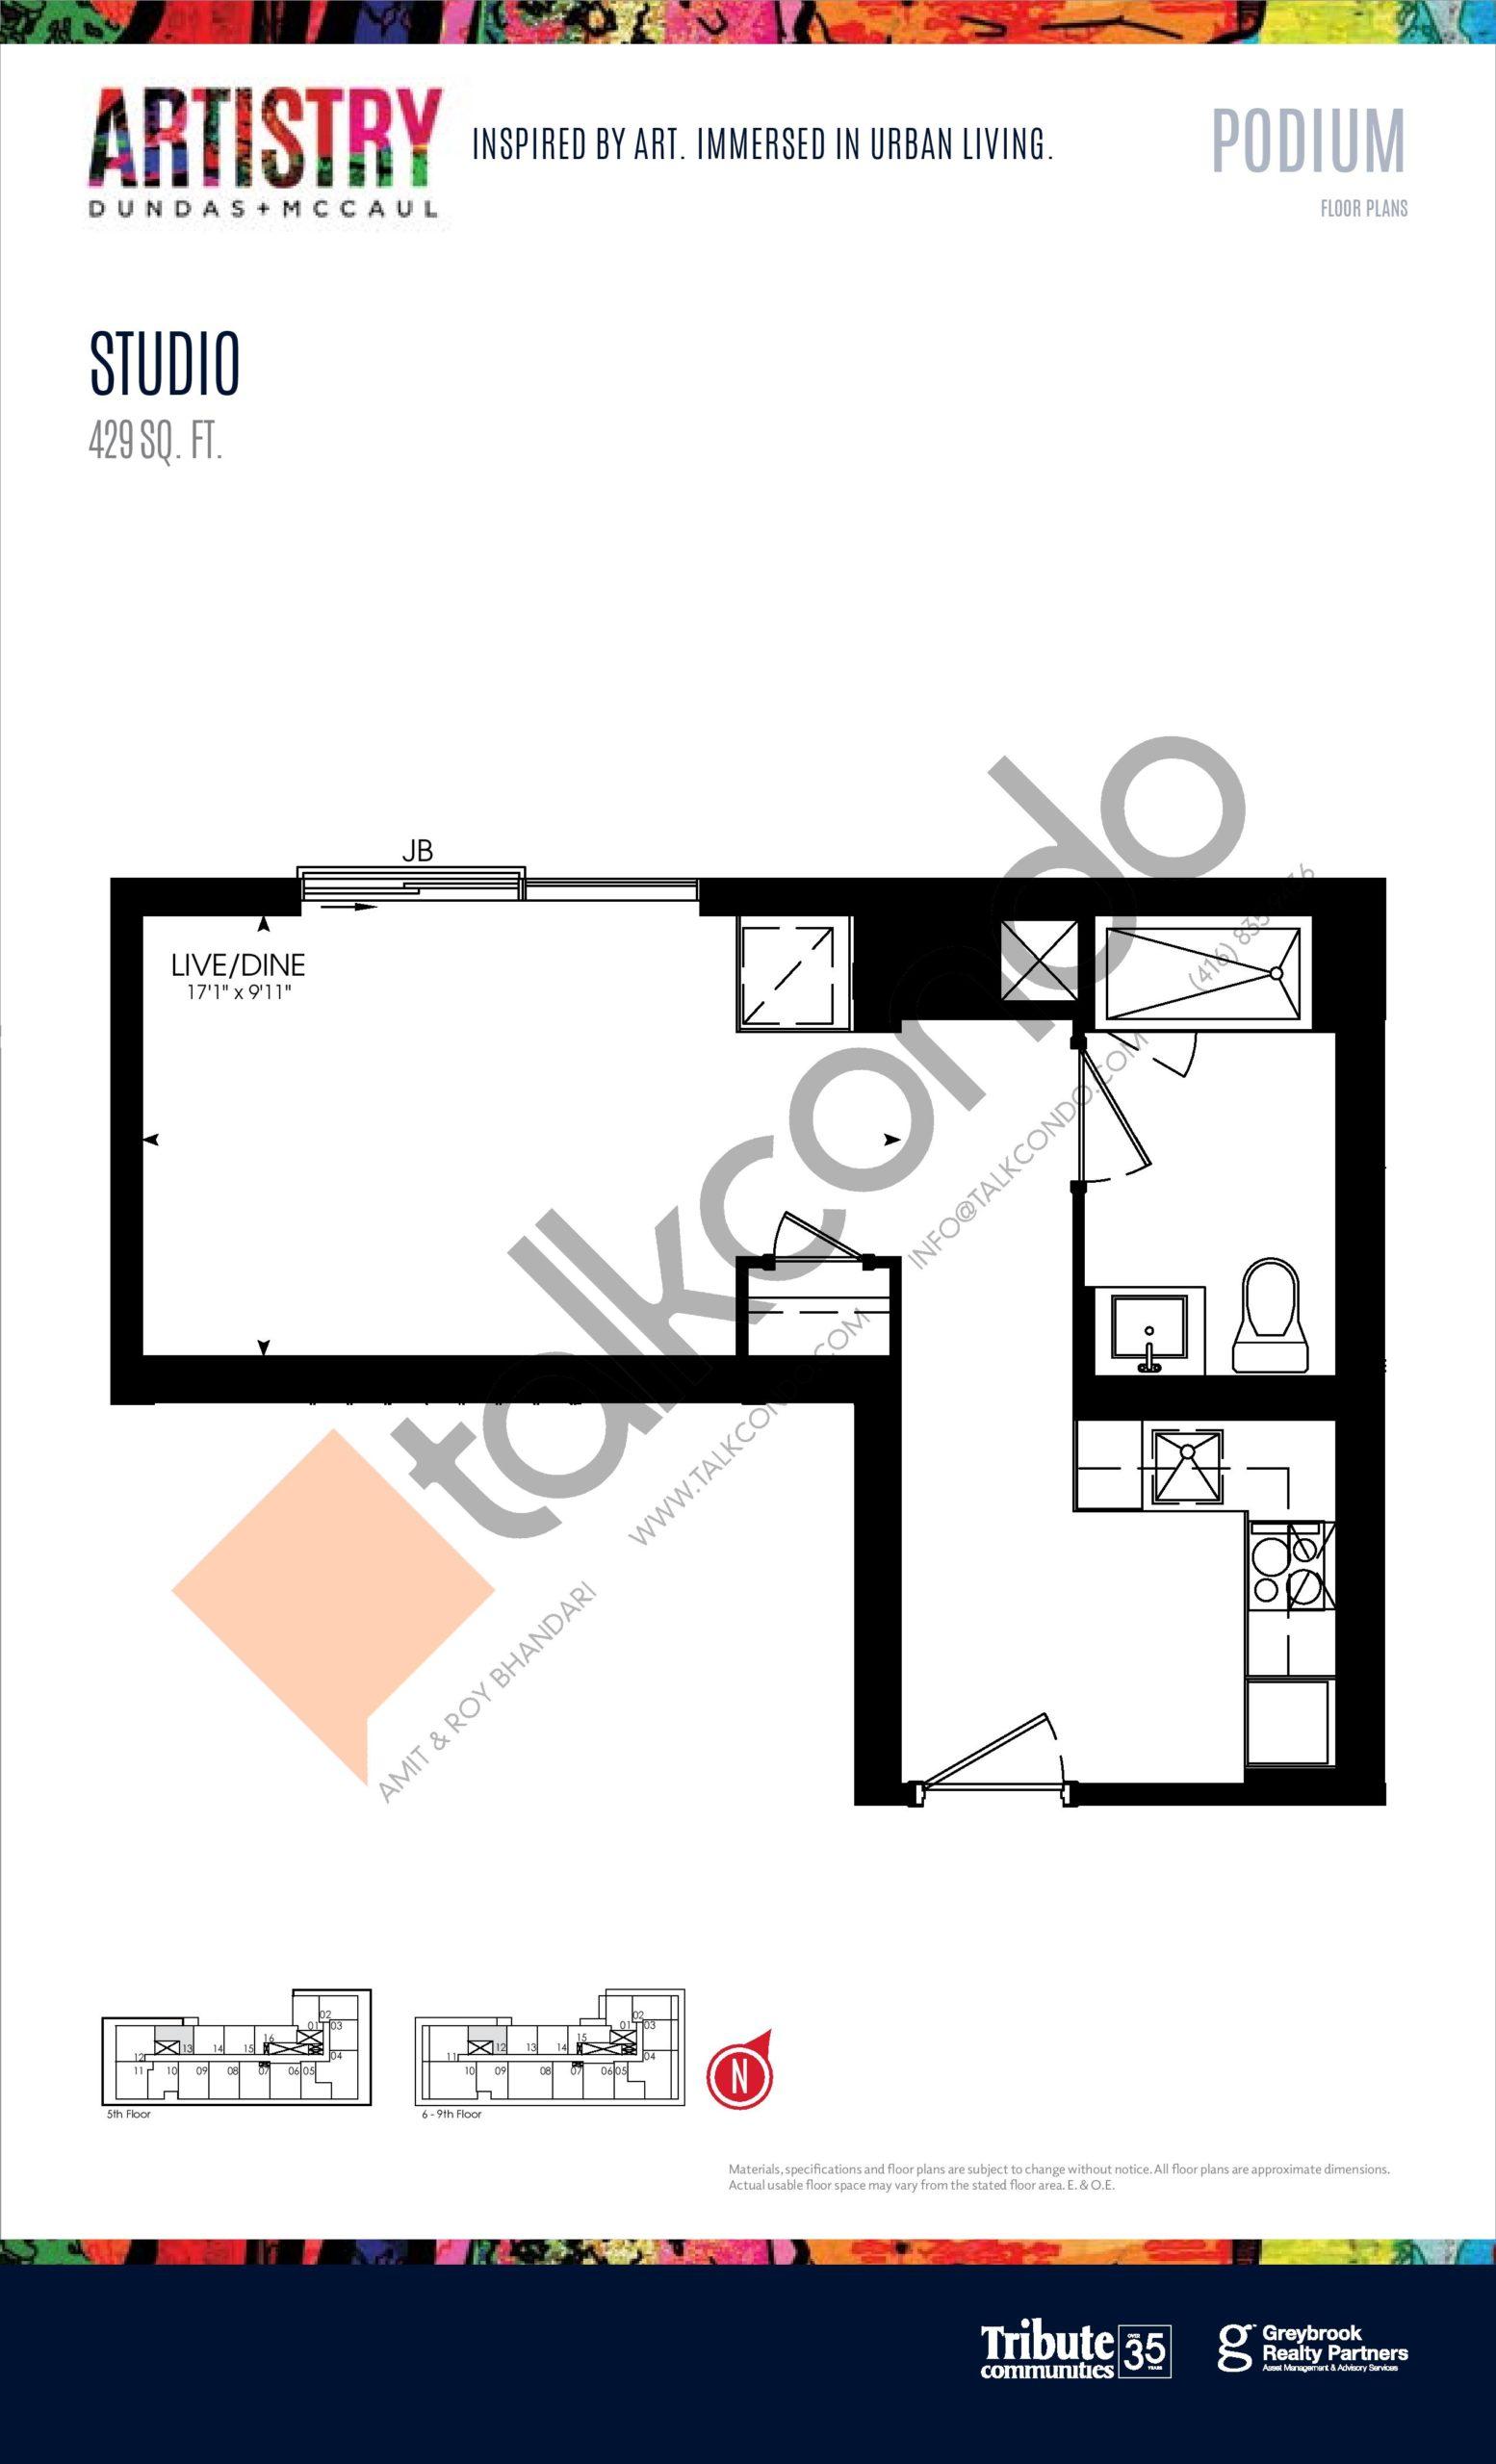 429 sq. ft. - Podium Floor Plan at Artistry Condos - 429 sq.ft